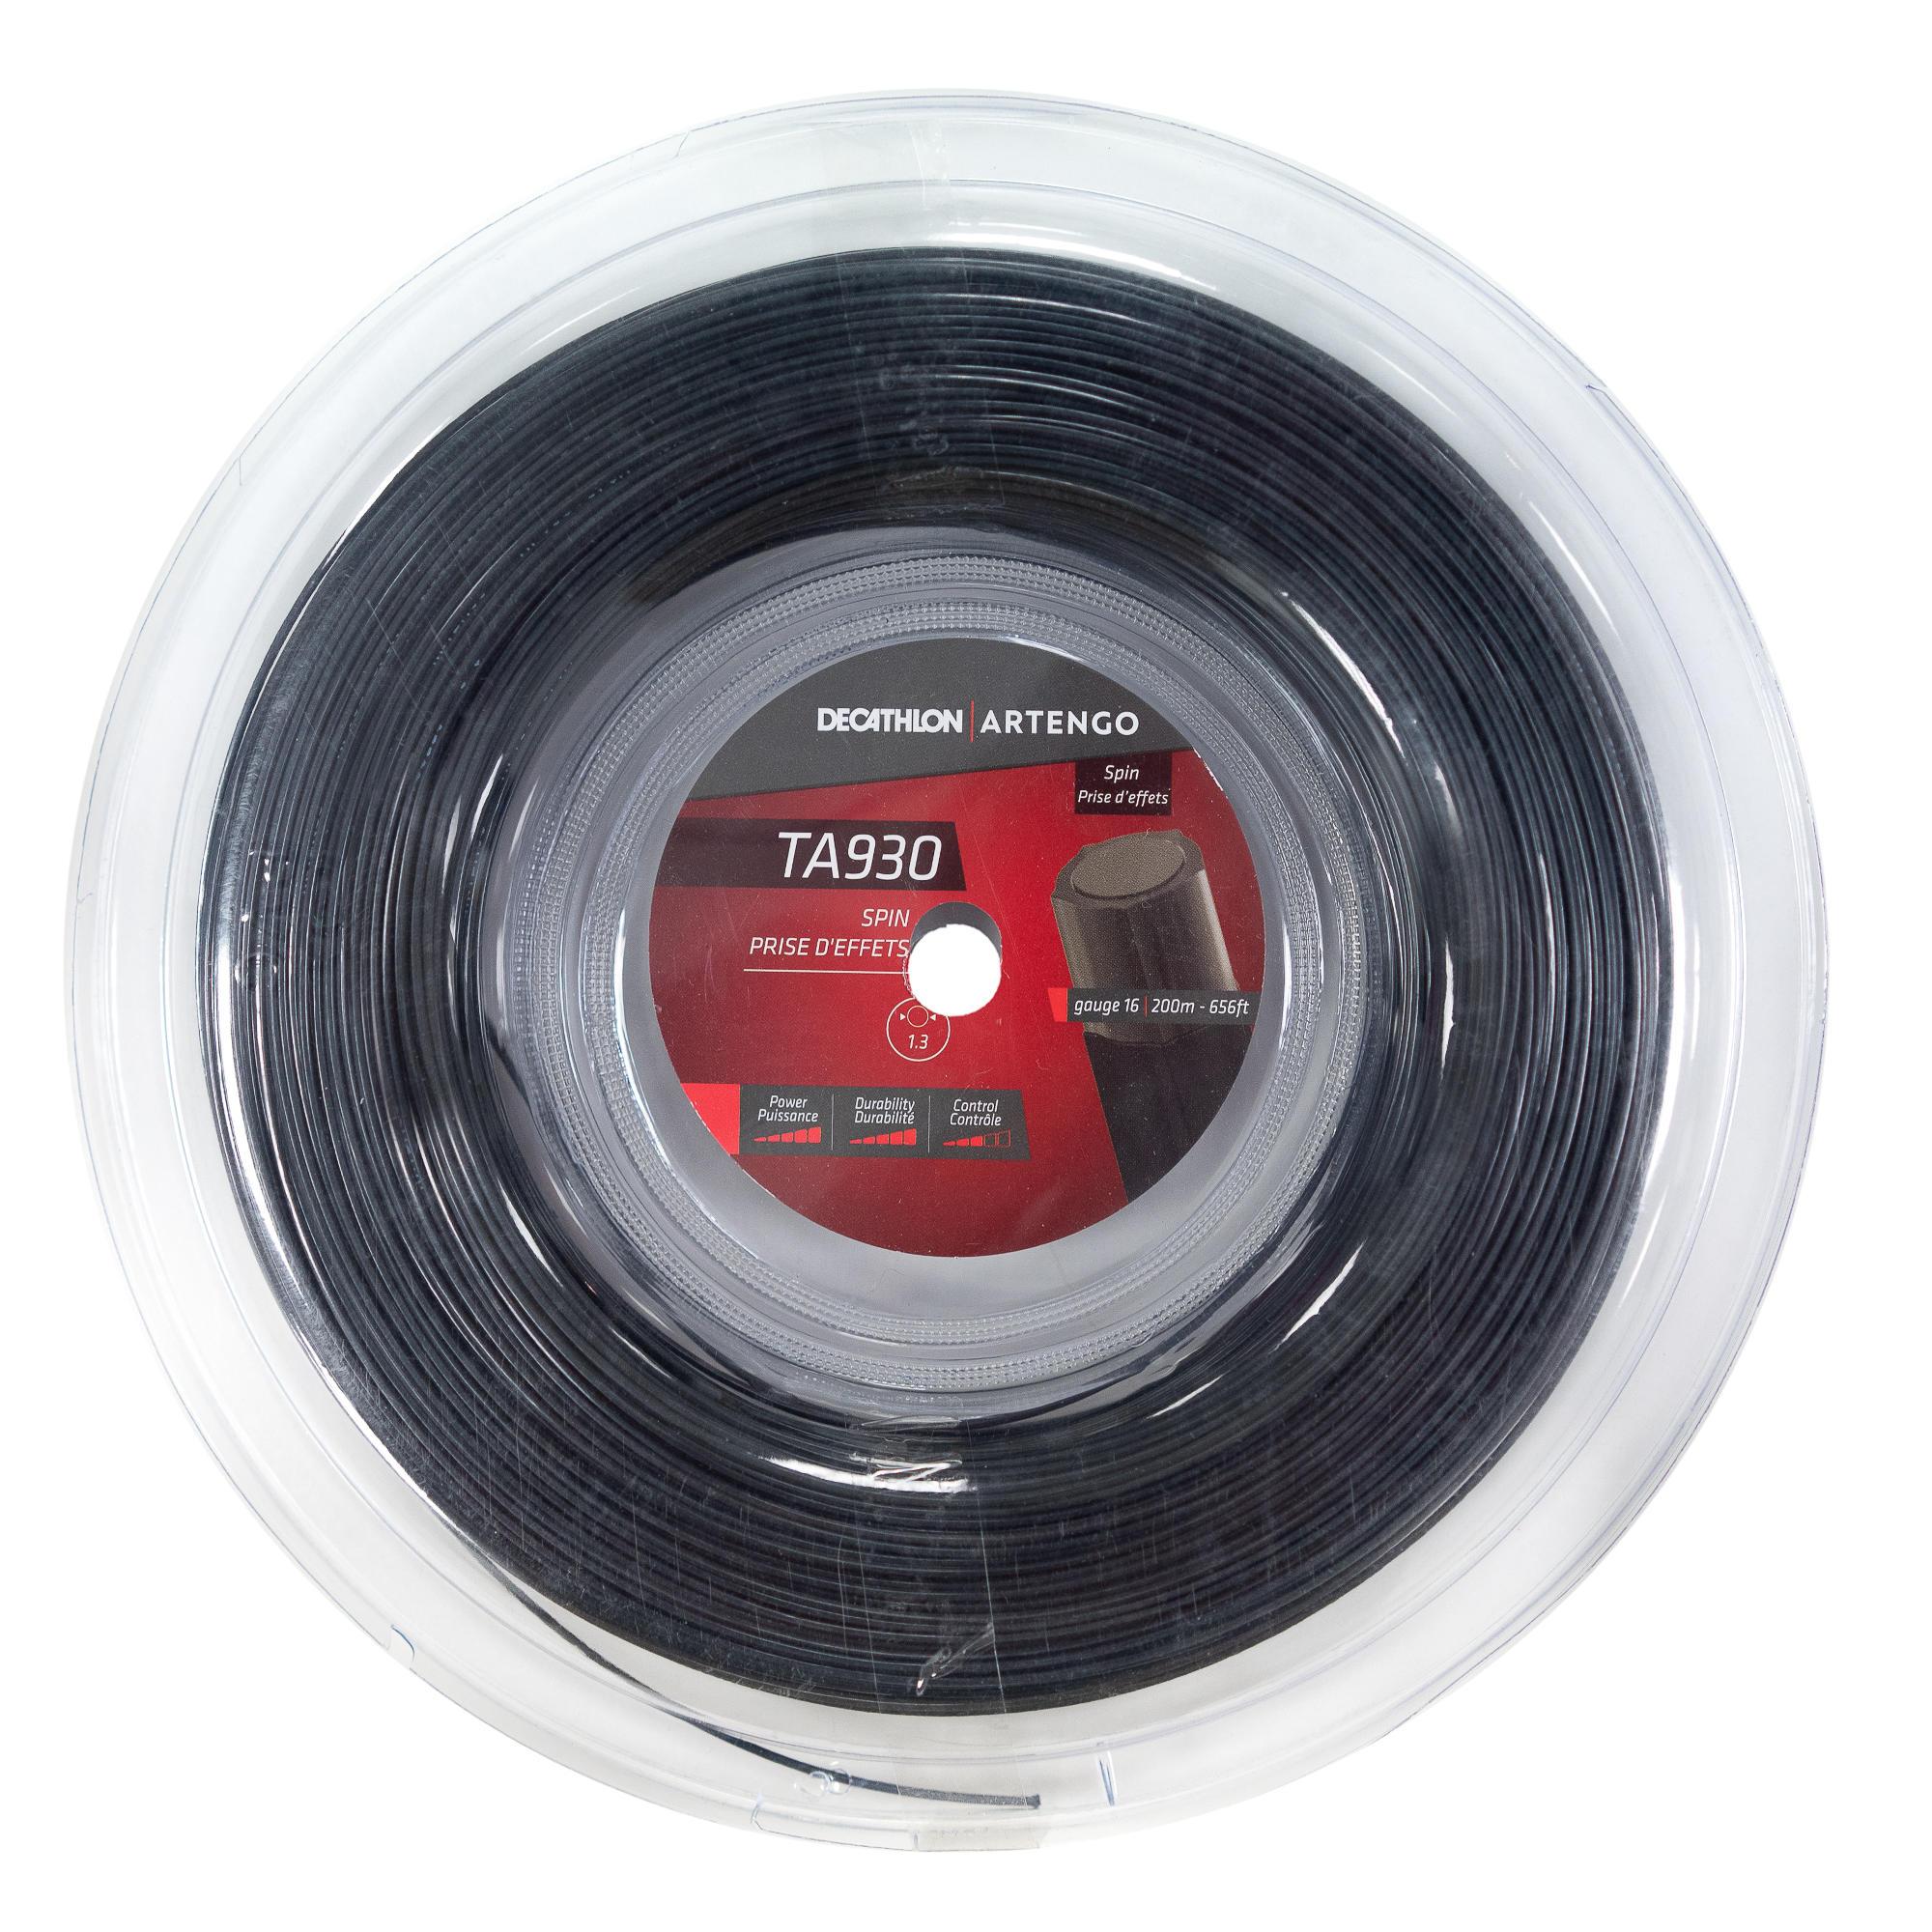 Artengo CORDAGE DE TENNIS MONOFILAMENT NOIR PENTAGONAL TA 930 SPIN EN JAUGE 1.25 mm - Artengo